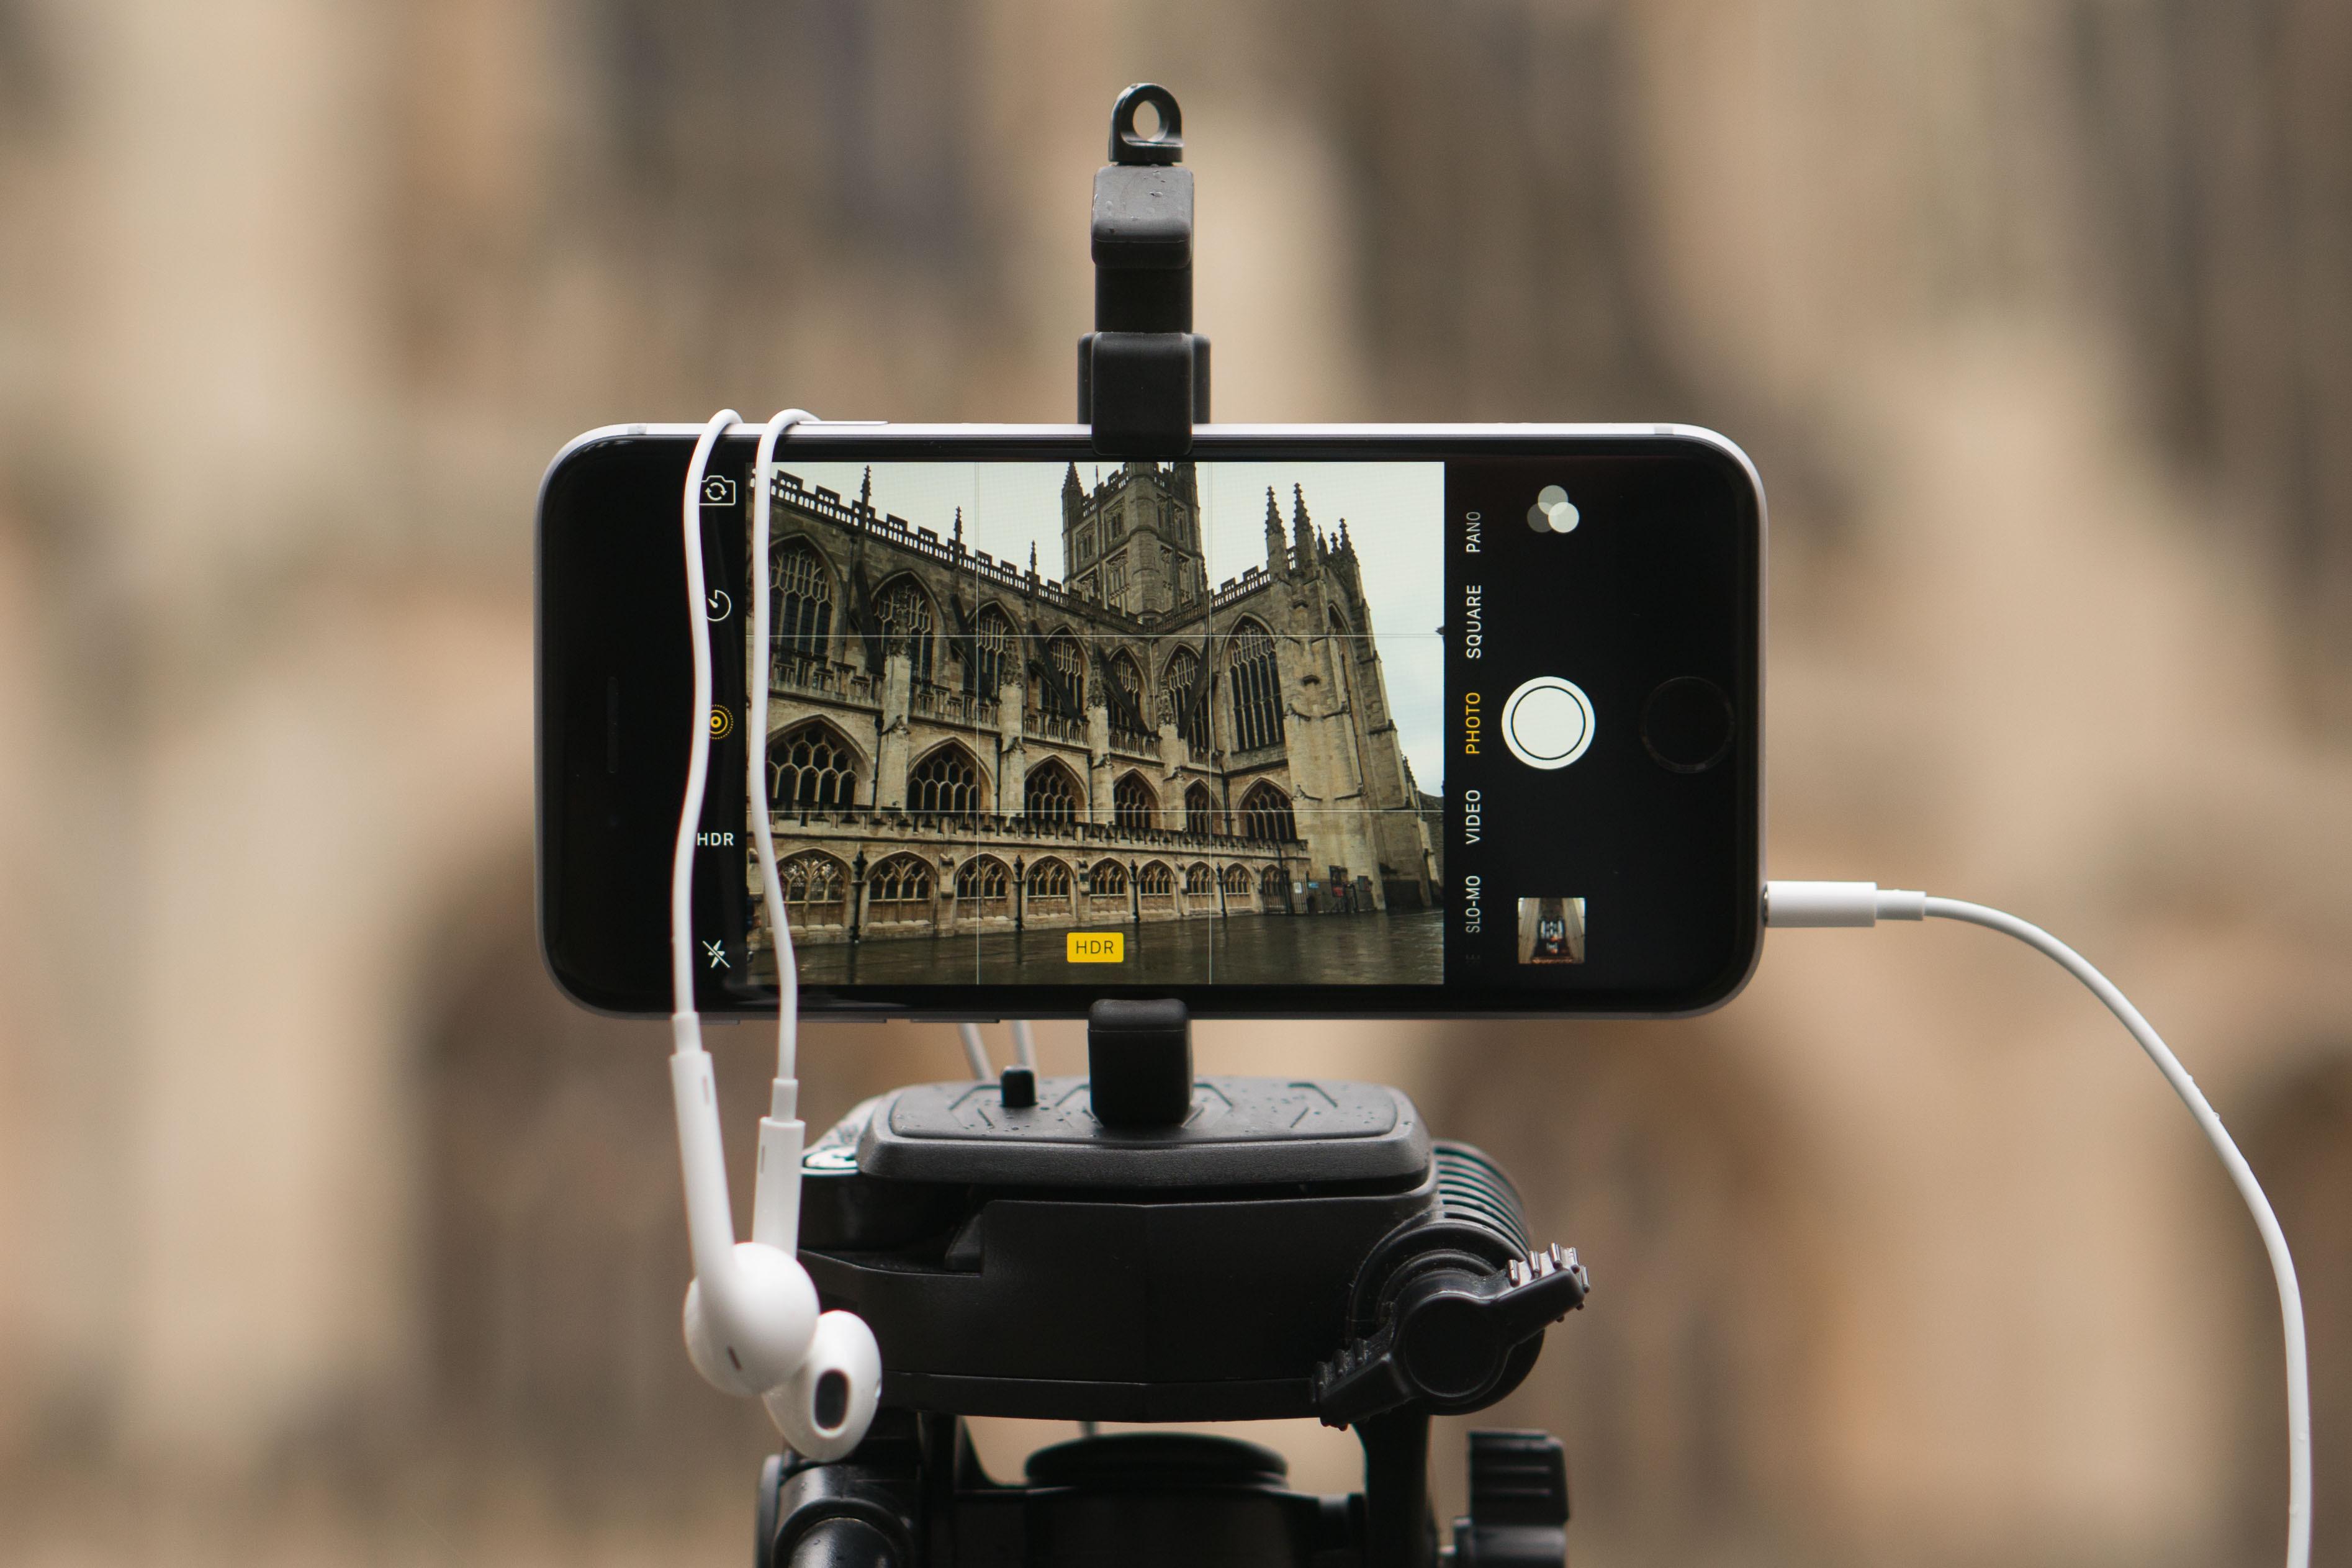 12 awesome iPhone camera tricks anyone can do | Macworld